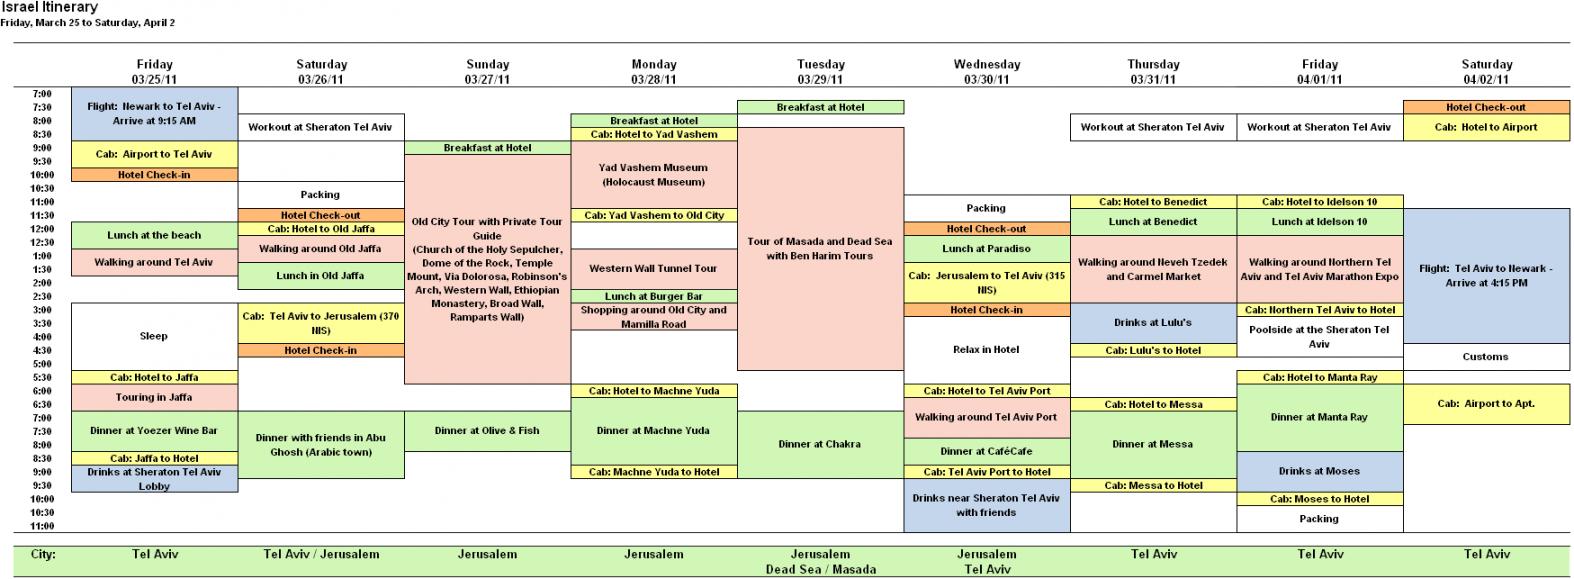 printable israel itinerary  travel itinerary template itinerary professional travel itinerary template word